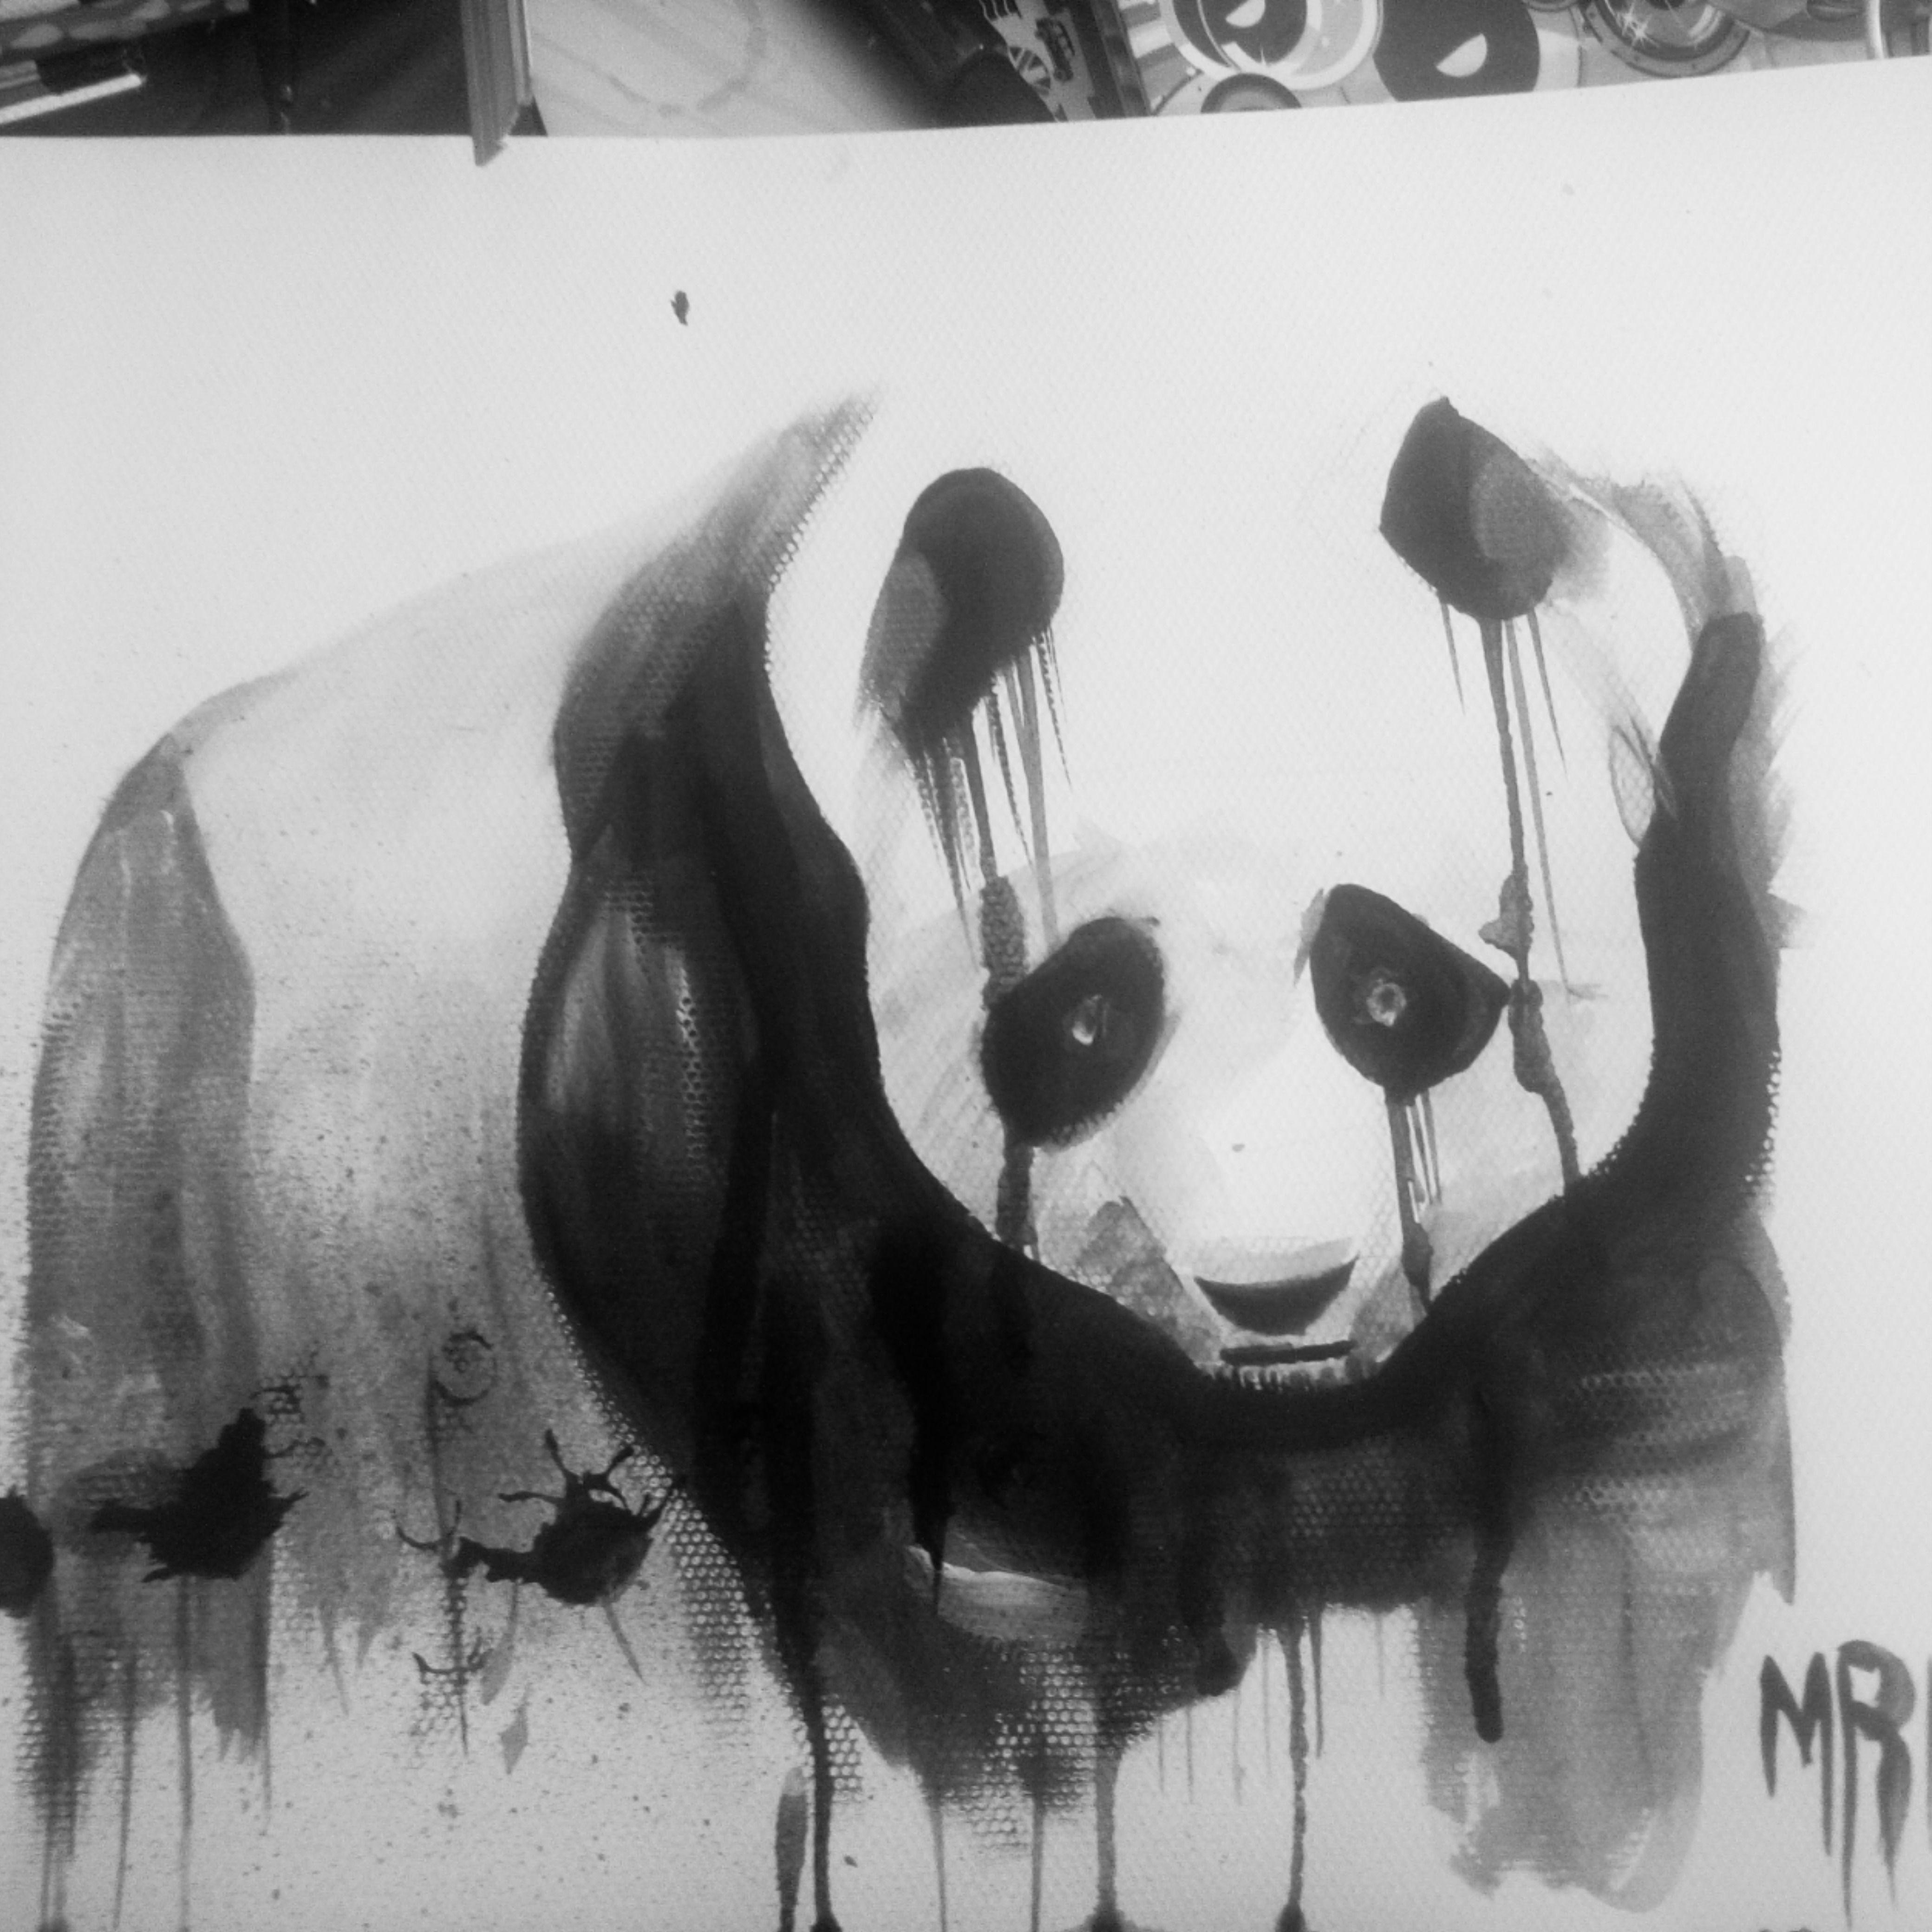 Painting Panda By Watercolor رسم الباندا بالألوان المائية Drawings Art Watercolor Paper